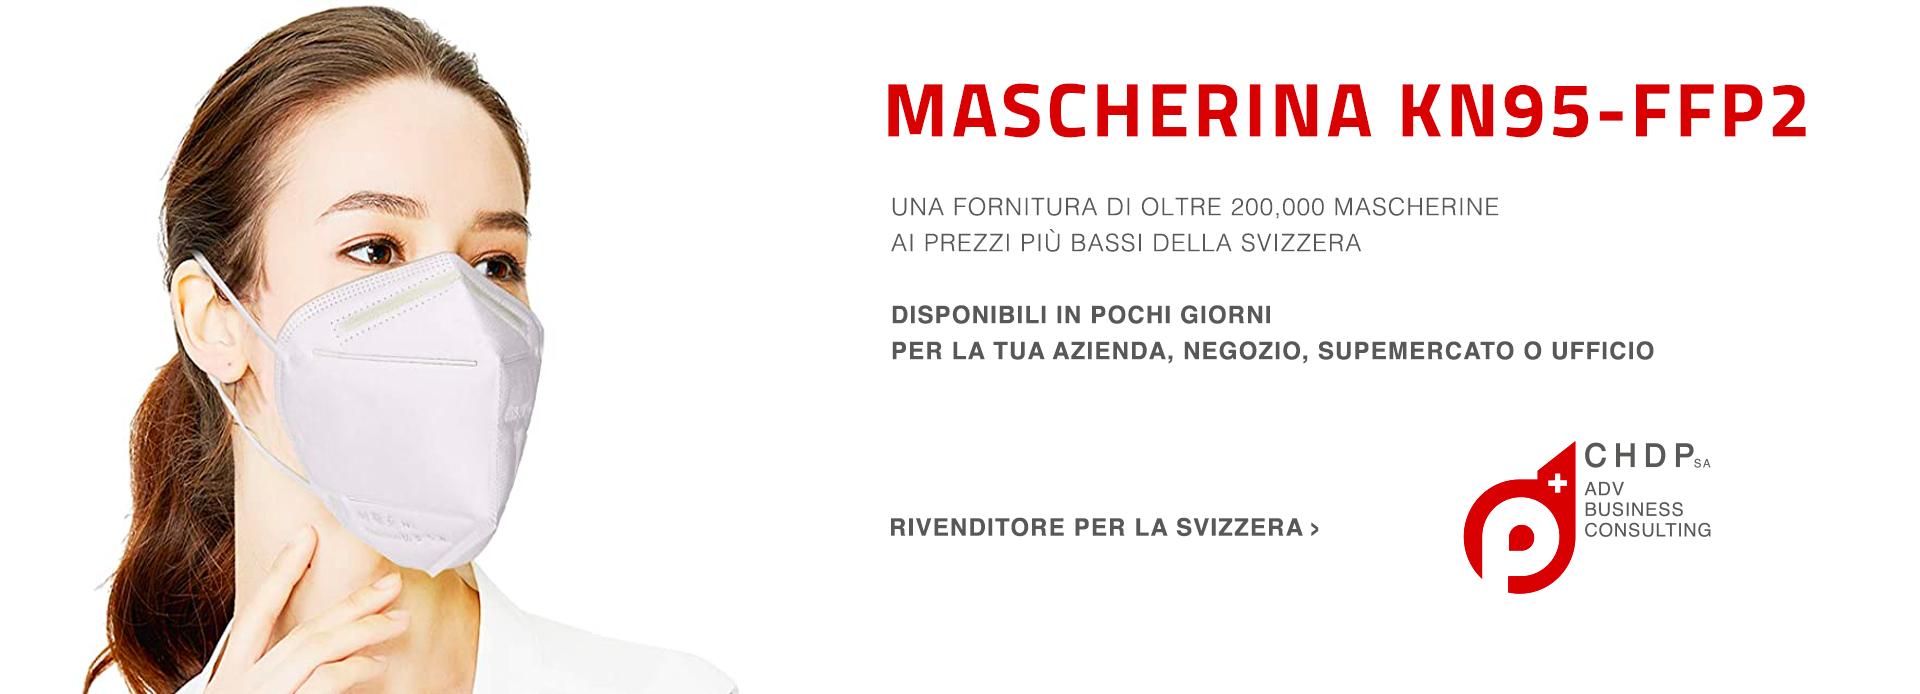 Mascherine KN95-FFP2 per la tua azienda in Svizzera